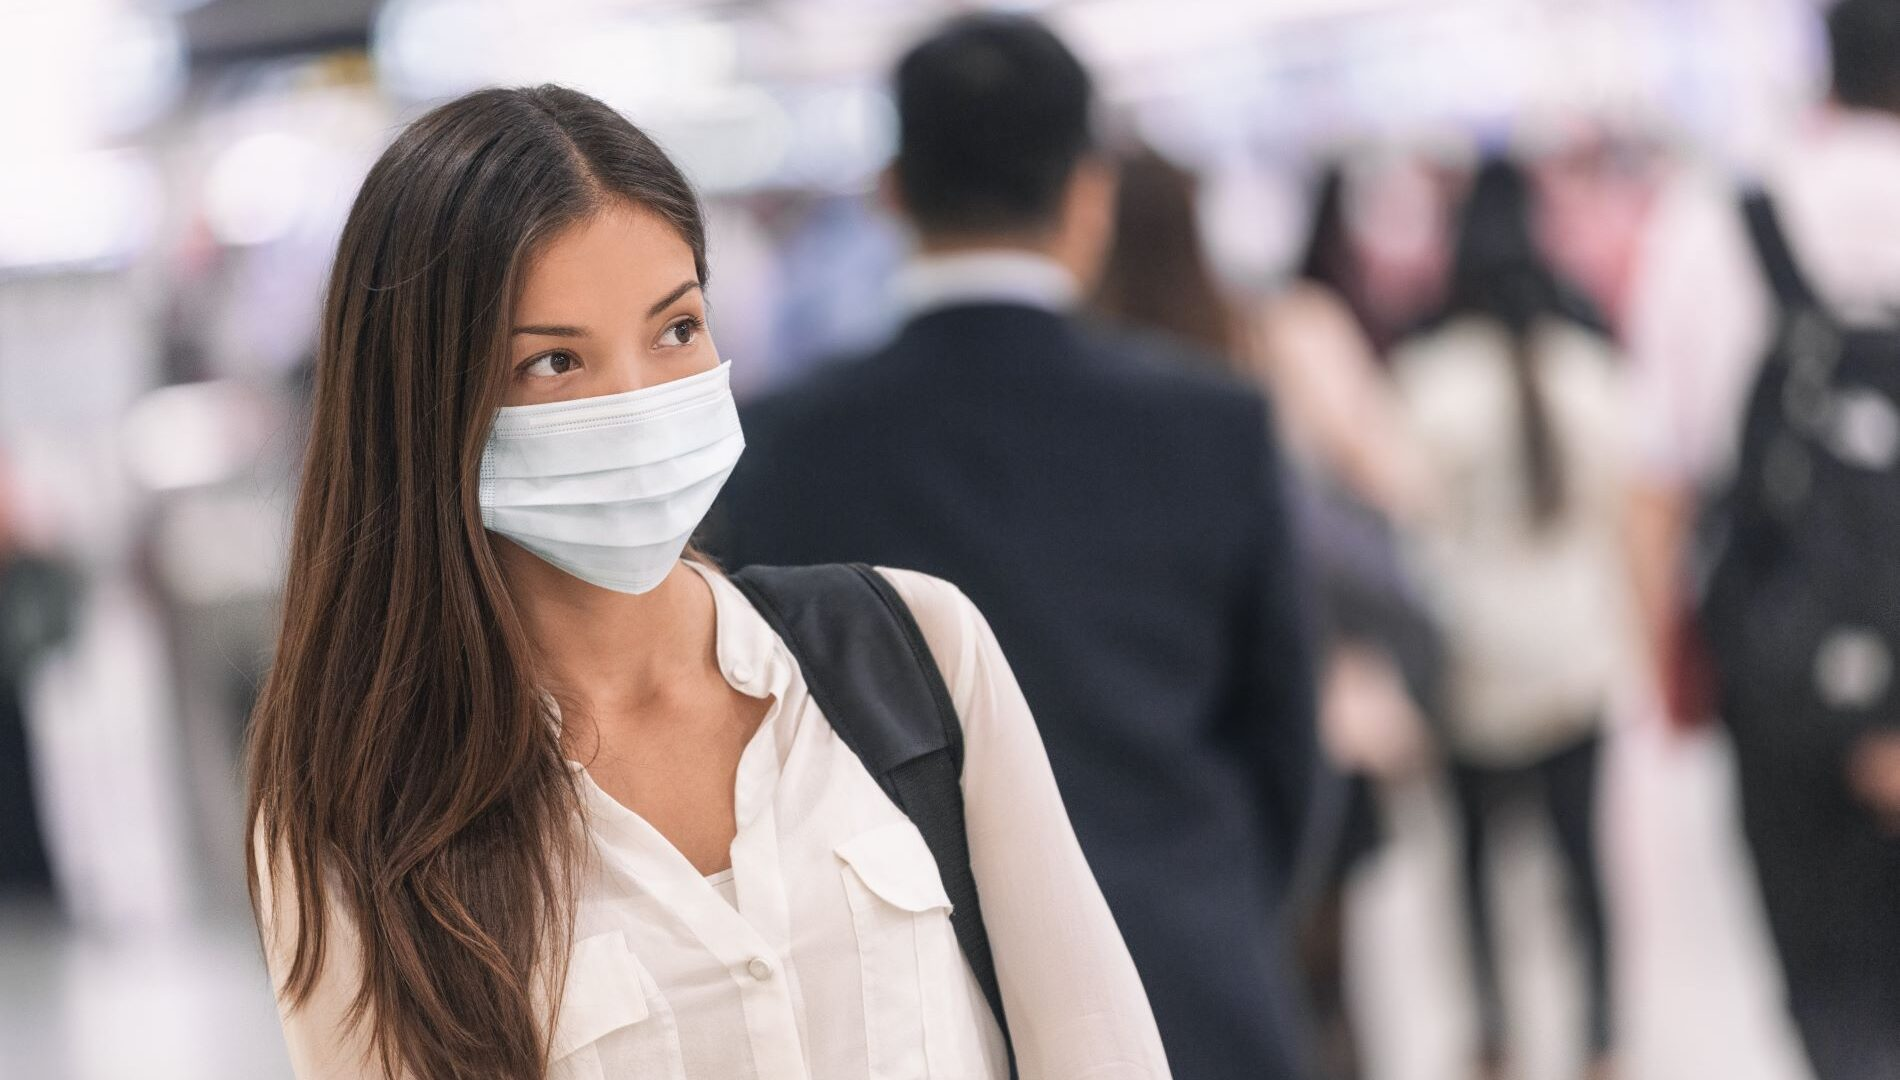 mascherina anti virus fai da